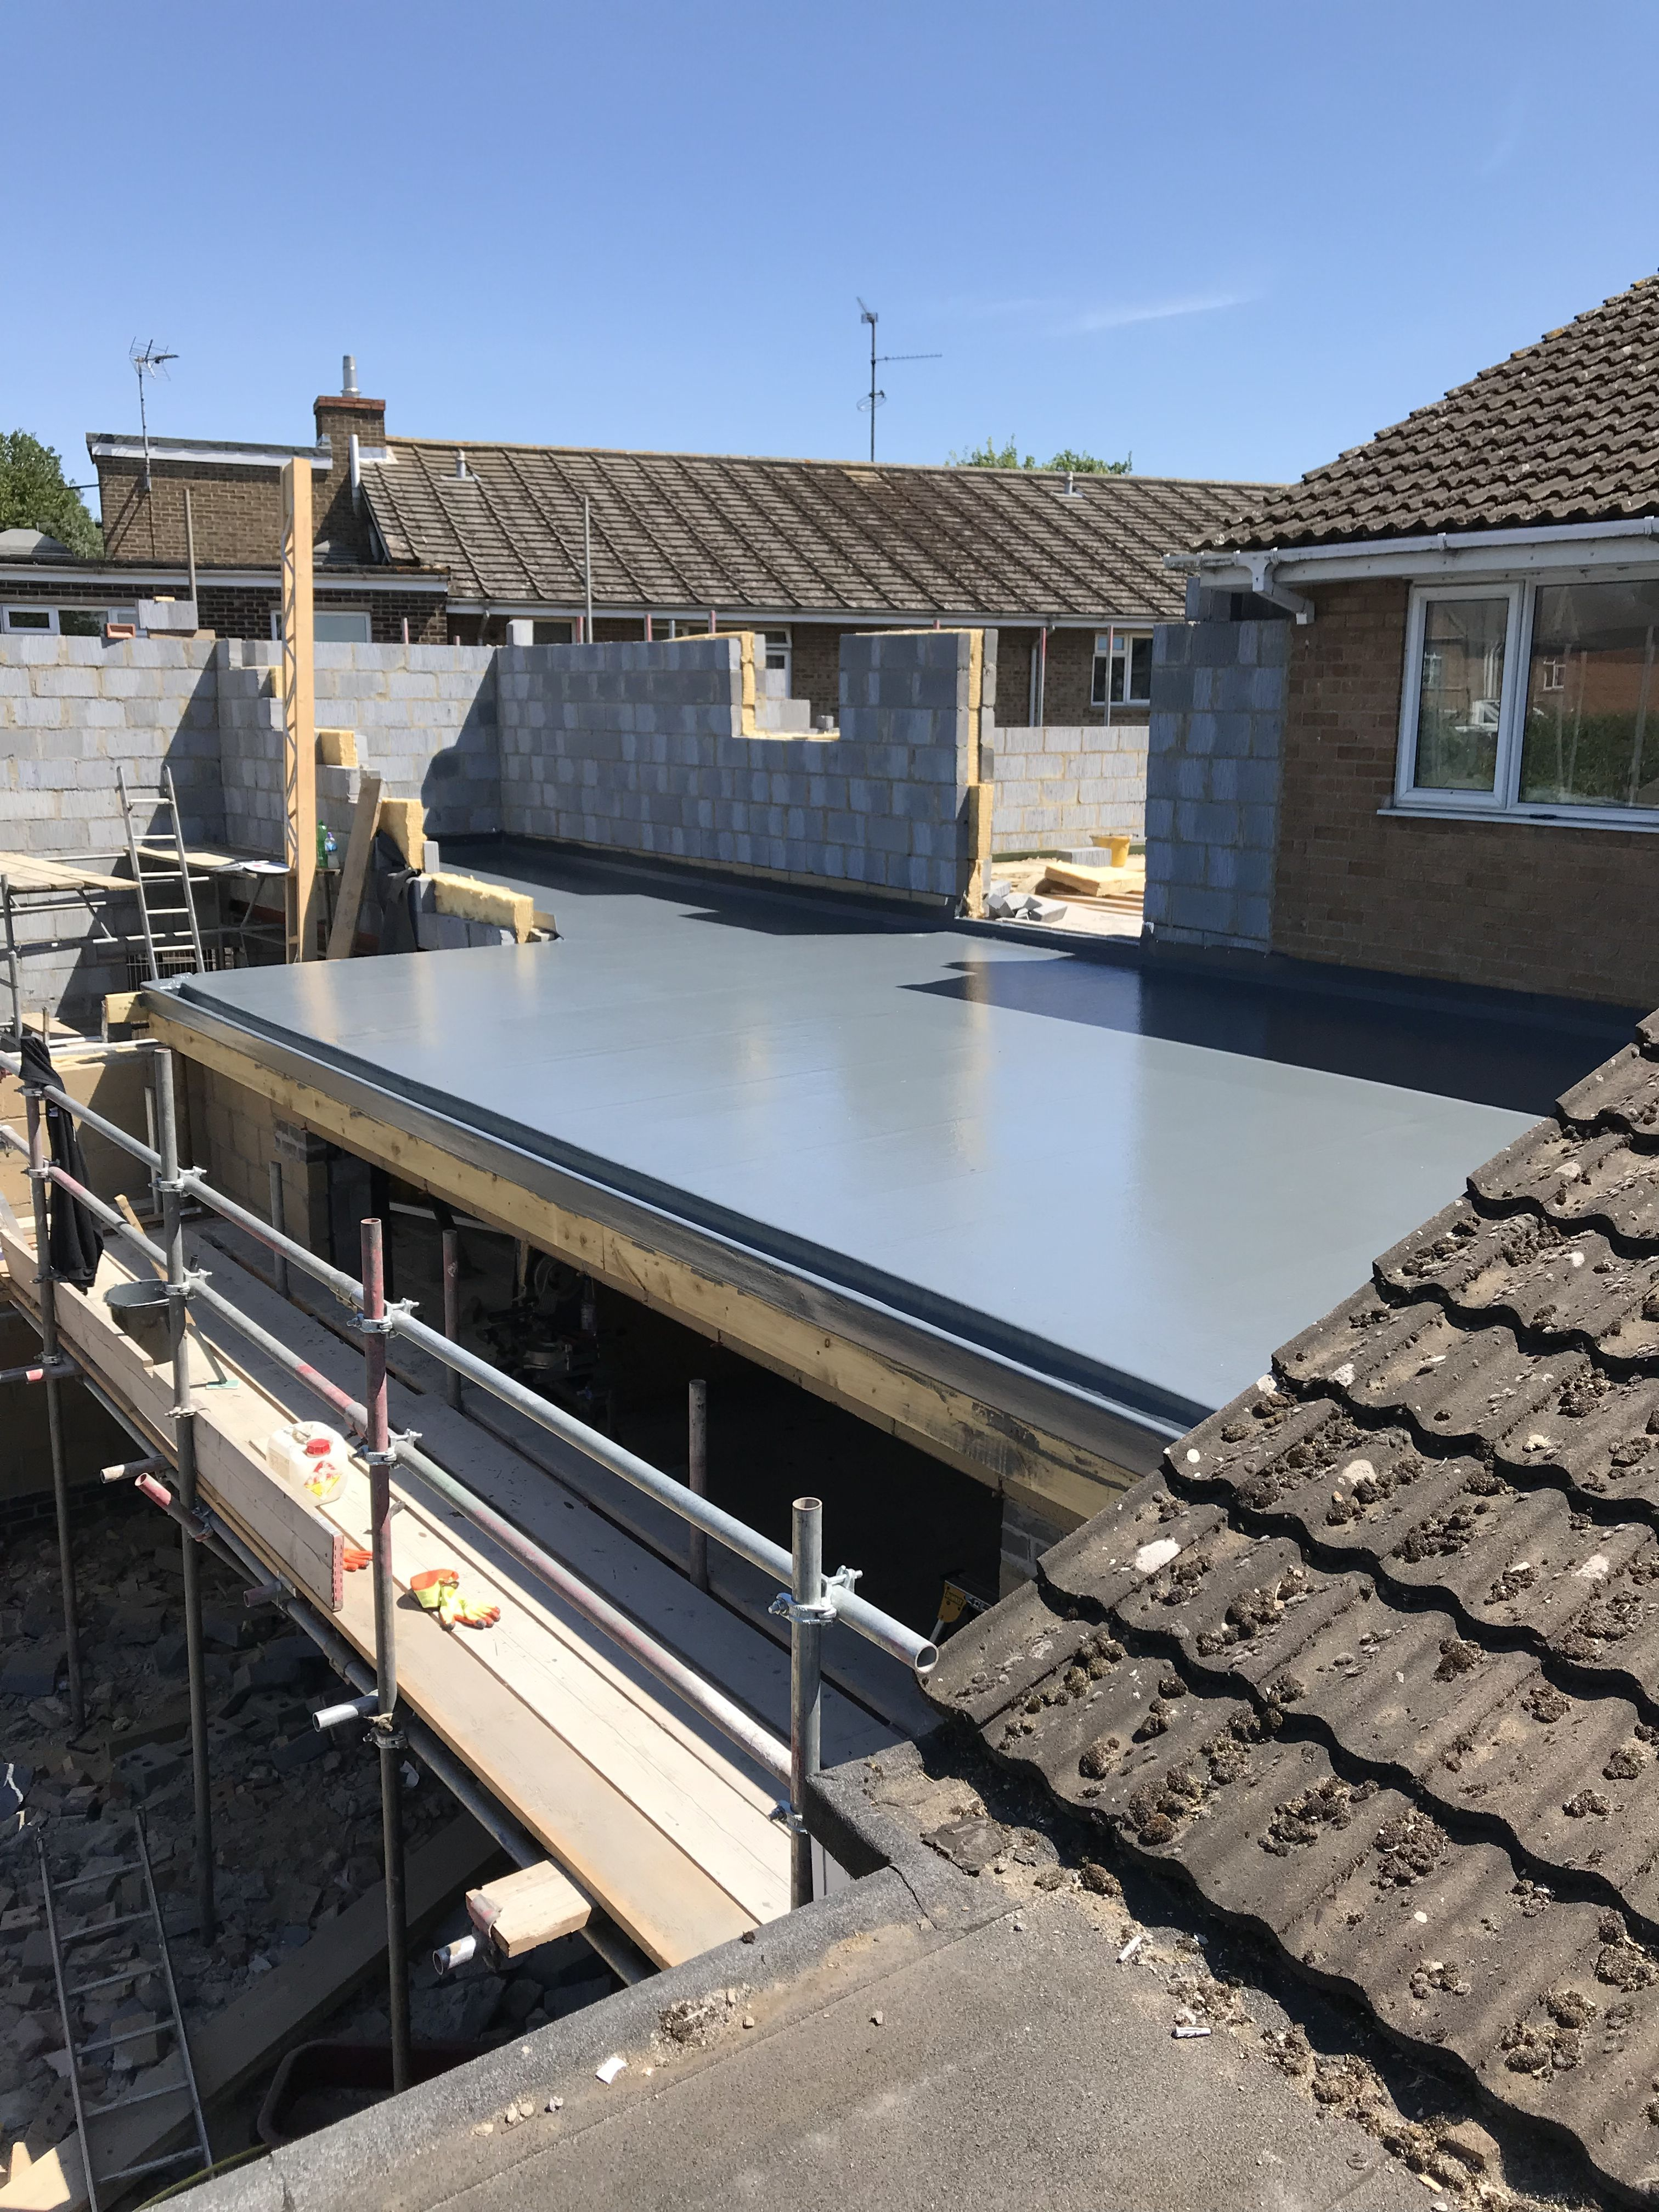 50m2 Grp Fibreglass Roof Terrace Fibreglass Roof Roof Construction House Roof